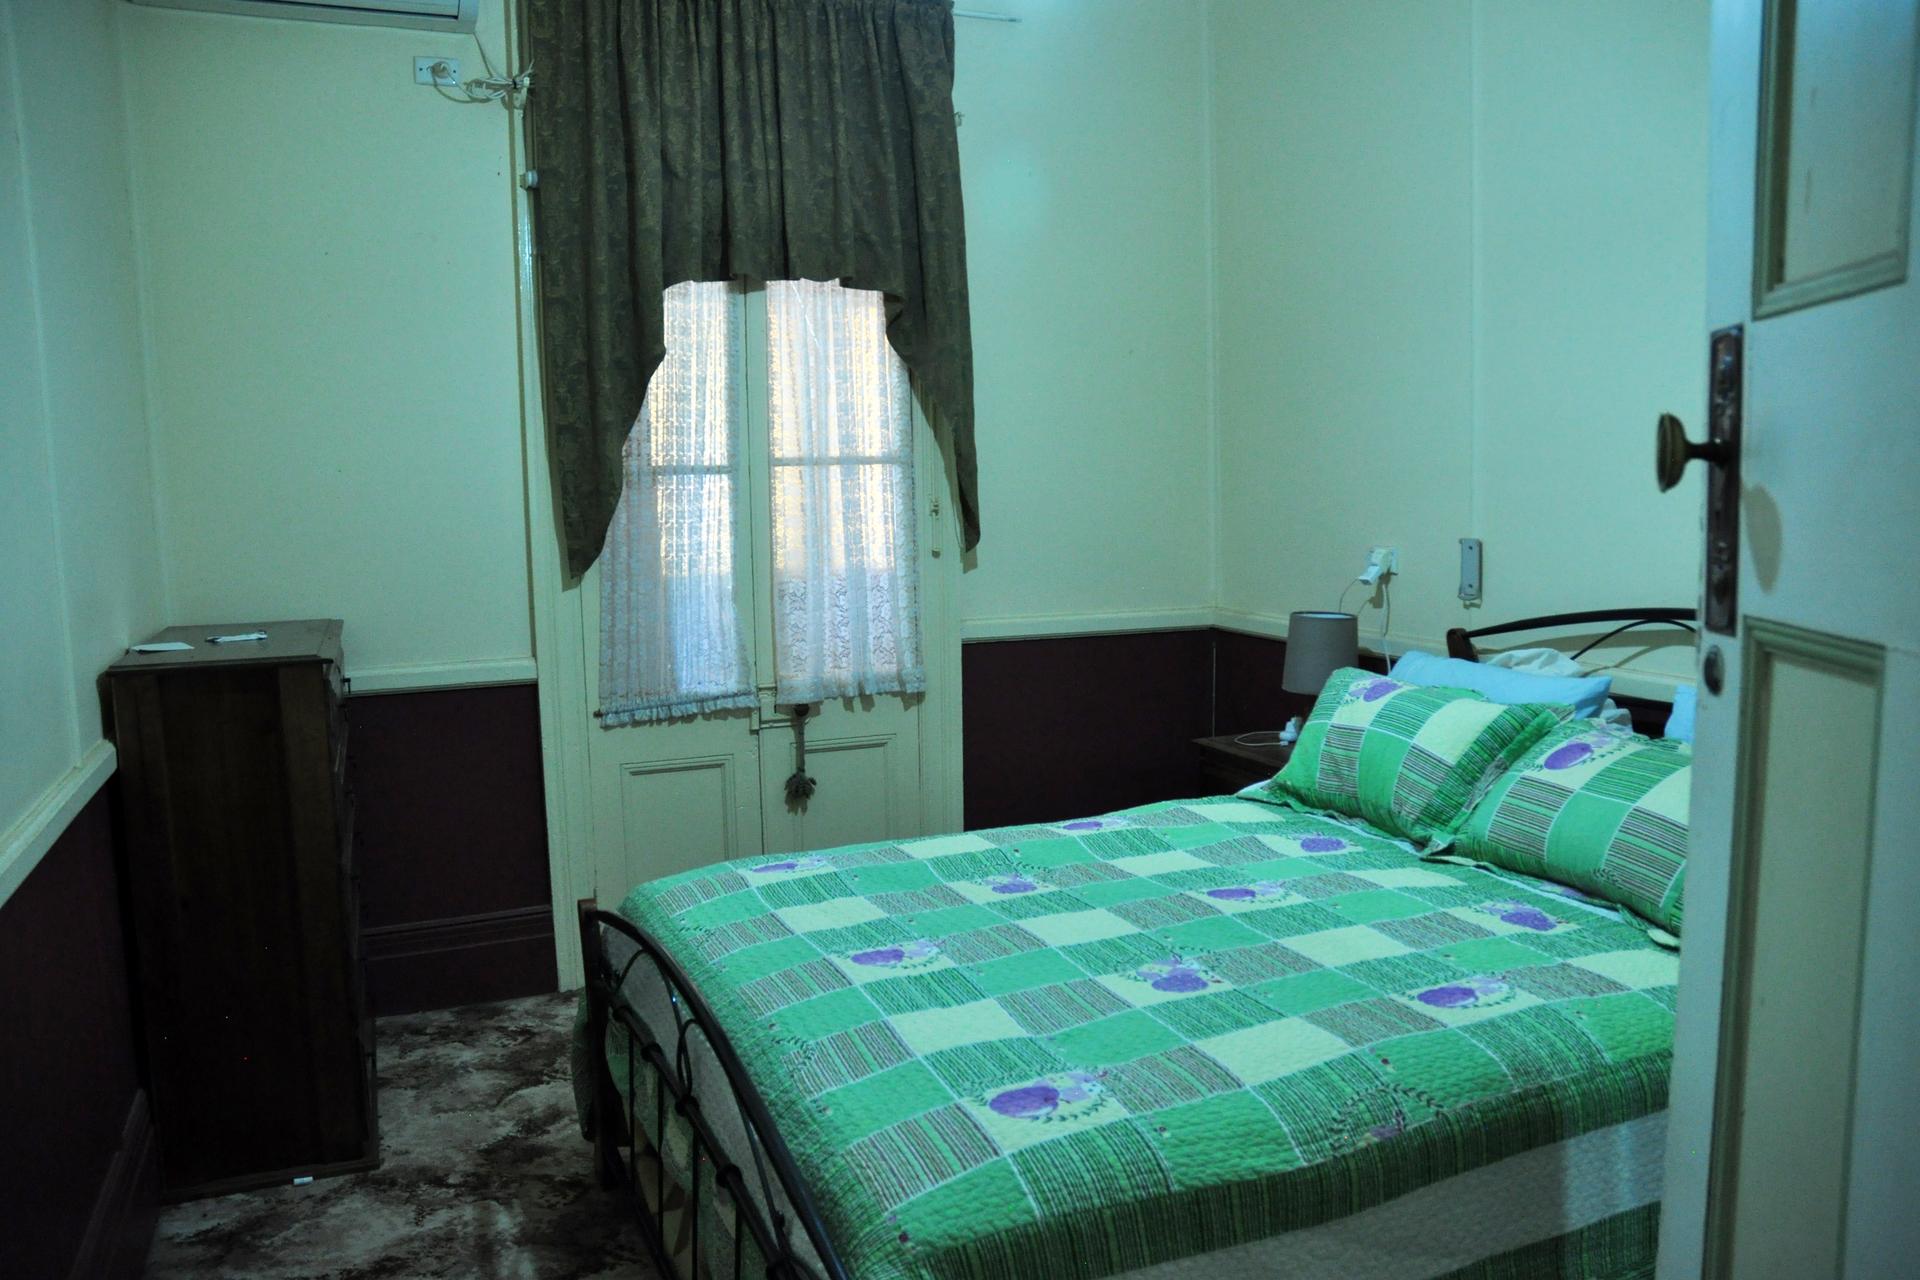 c - Bungalow Motel